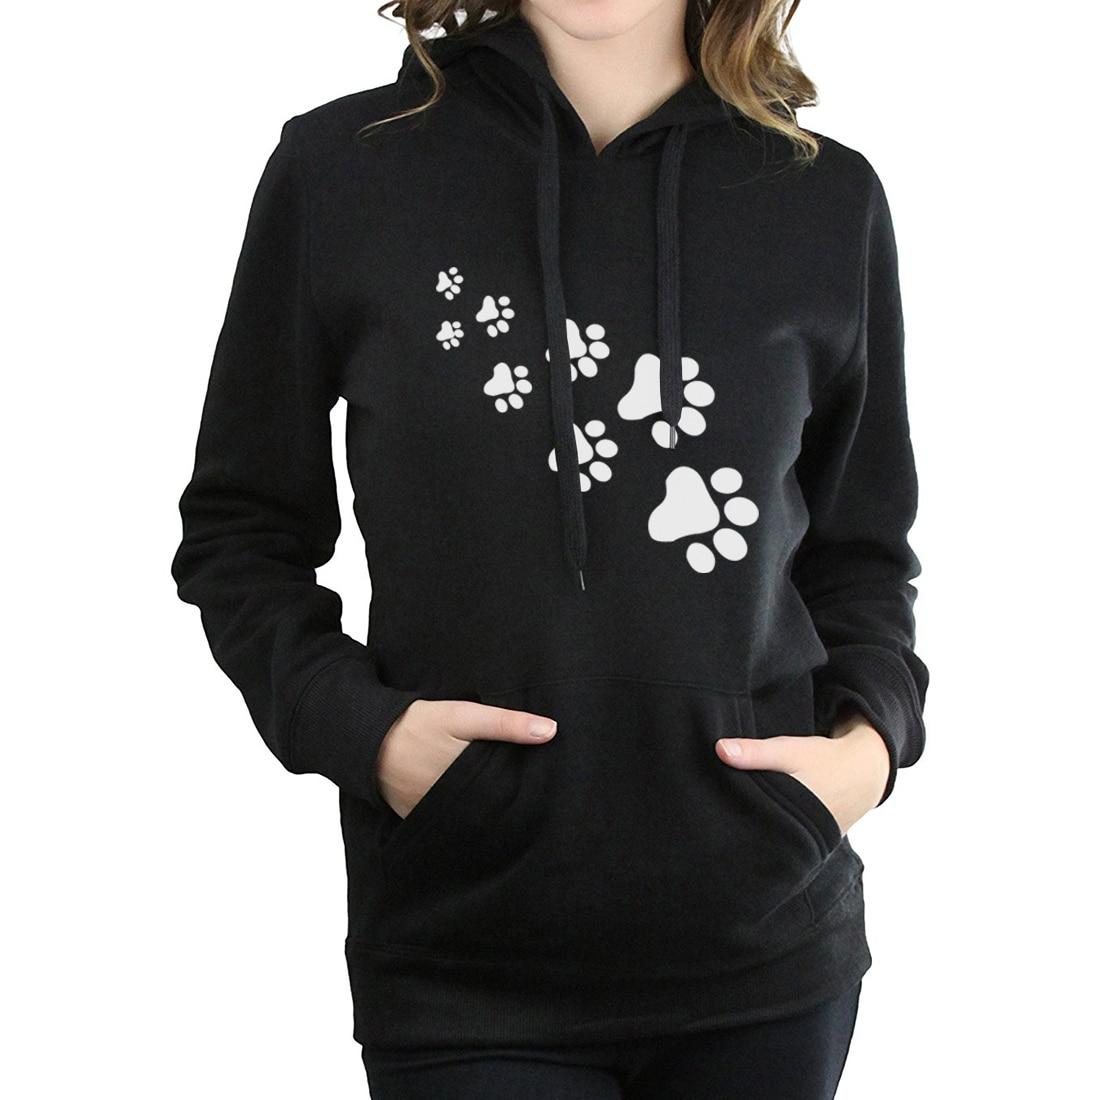 Casual fleece autumn winter sweatshirt pullovers 17 kawaii cat paws print hoodies for Women black pink brand tracksuits femme 1